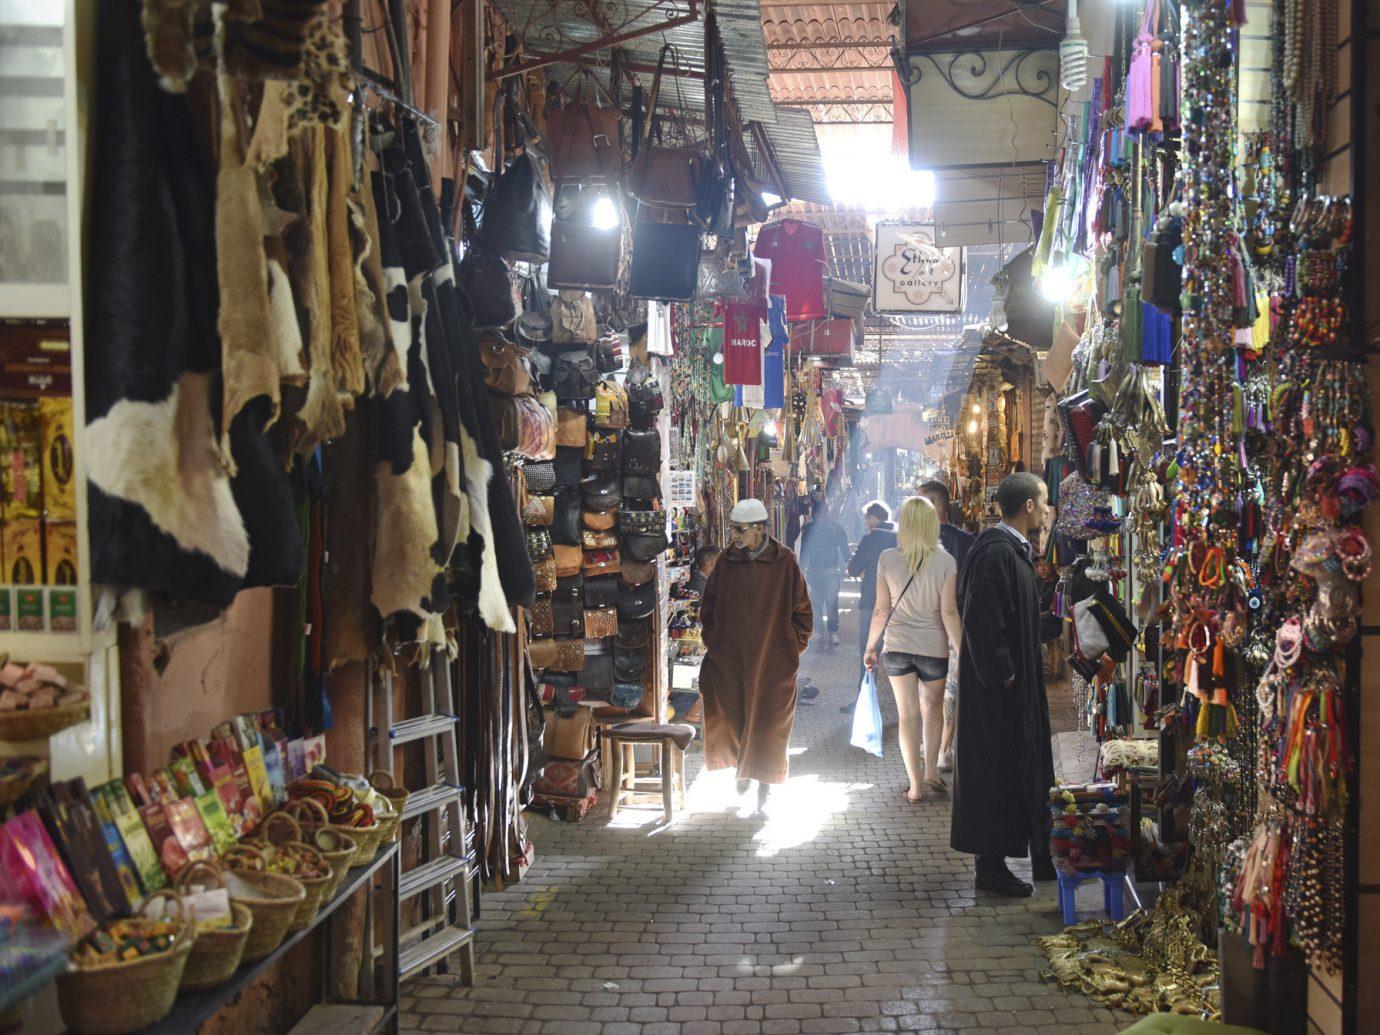 Trip Ideas market bazaar marketplace City public space indoor retail Boutique human settlement scene shopping vendor floristry store stall Shop